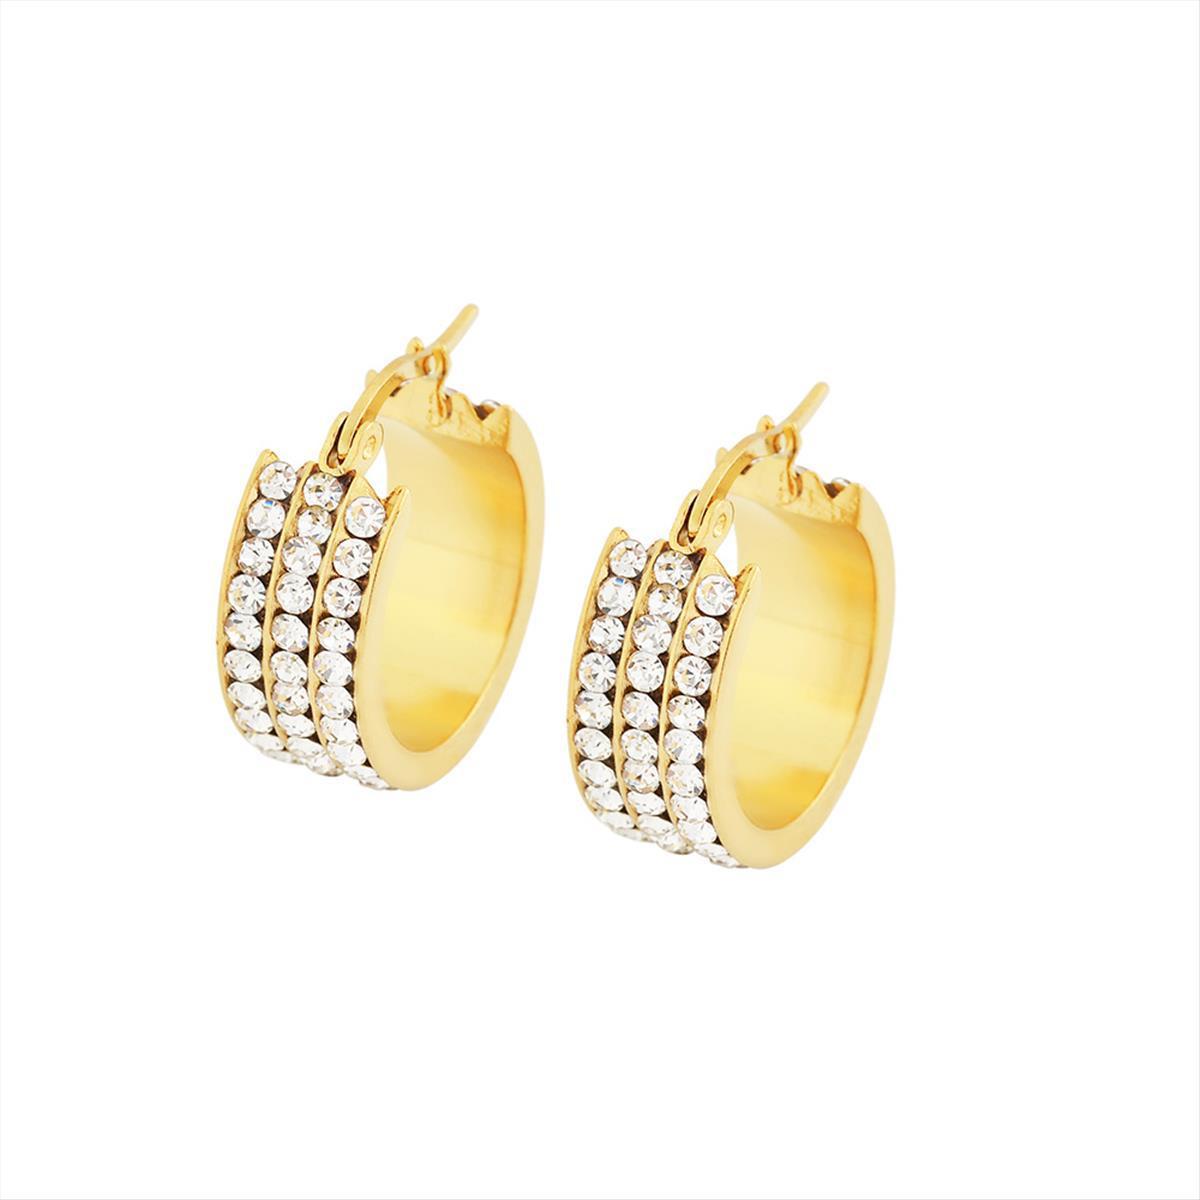 Boucles d'oreilles Edforce - 195-0292-E - Modalova